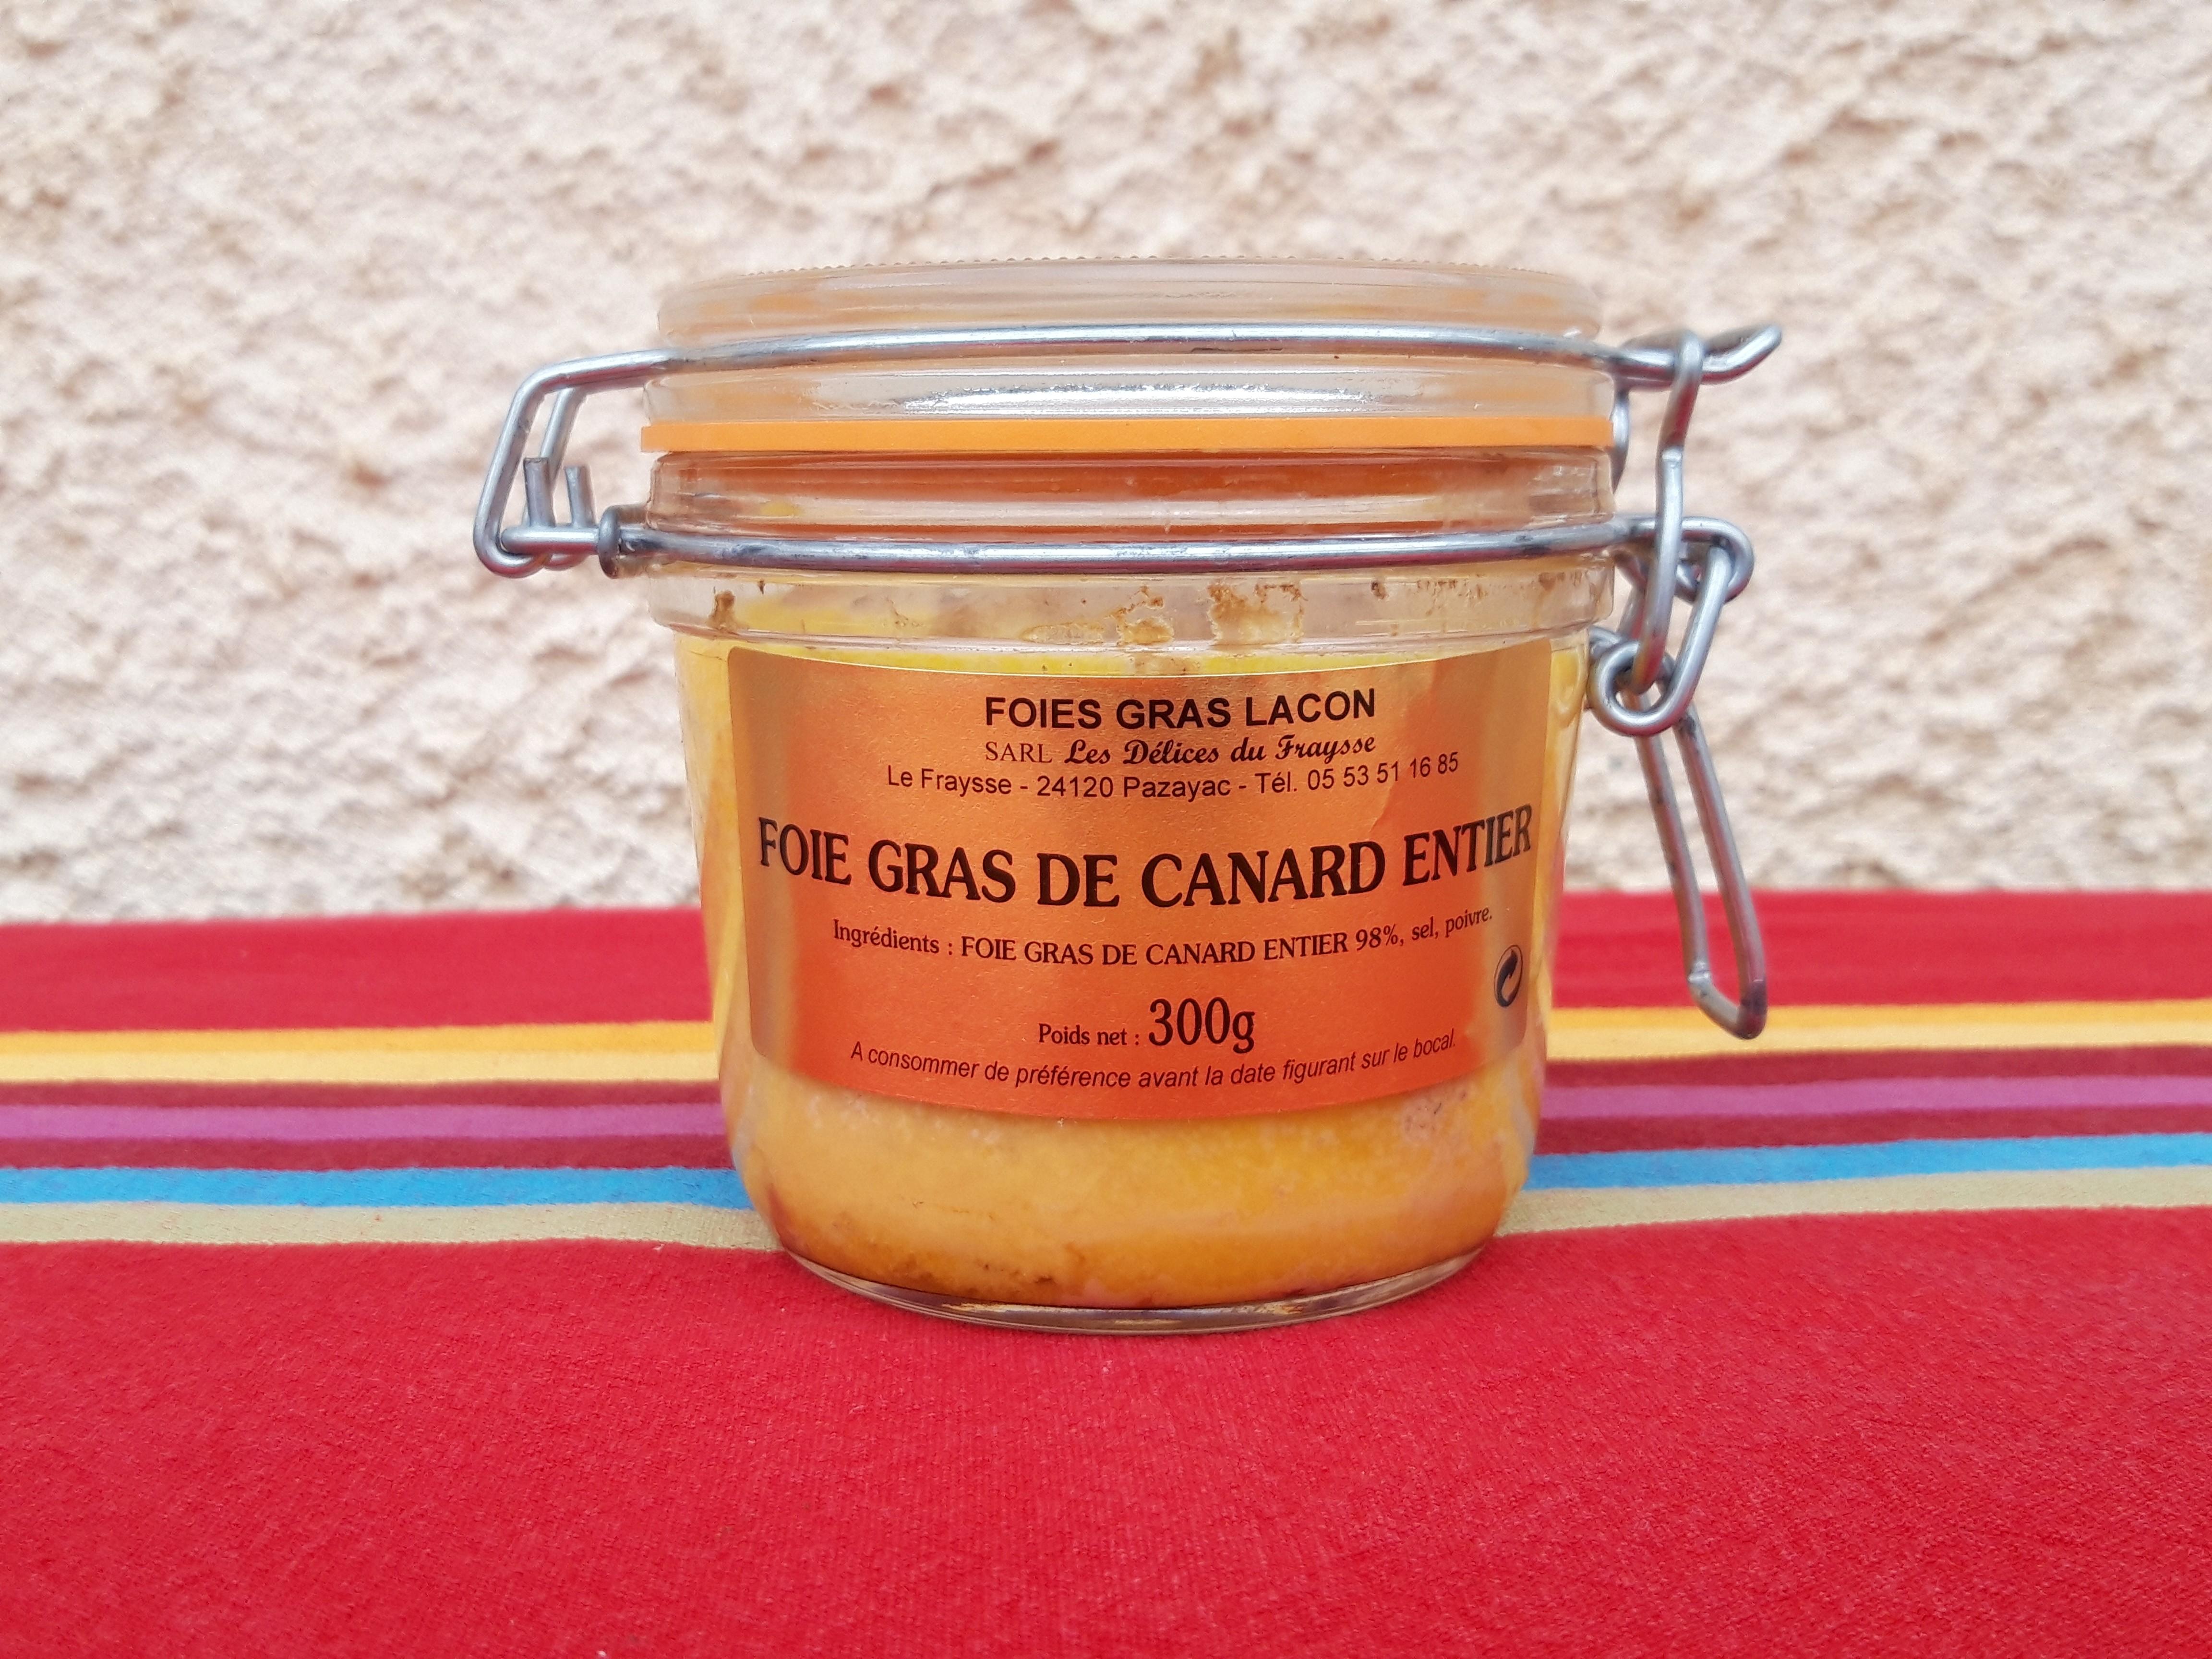 Foie gras entier 300g